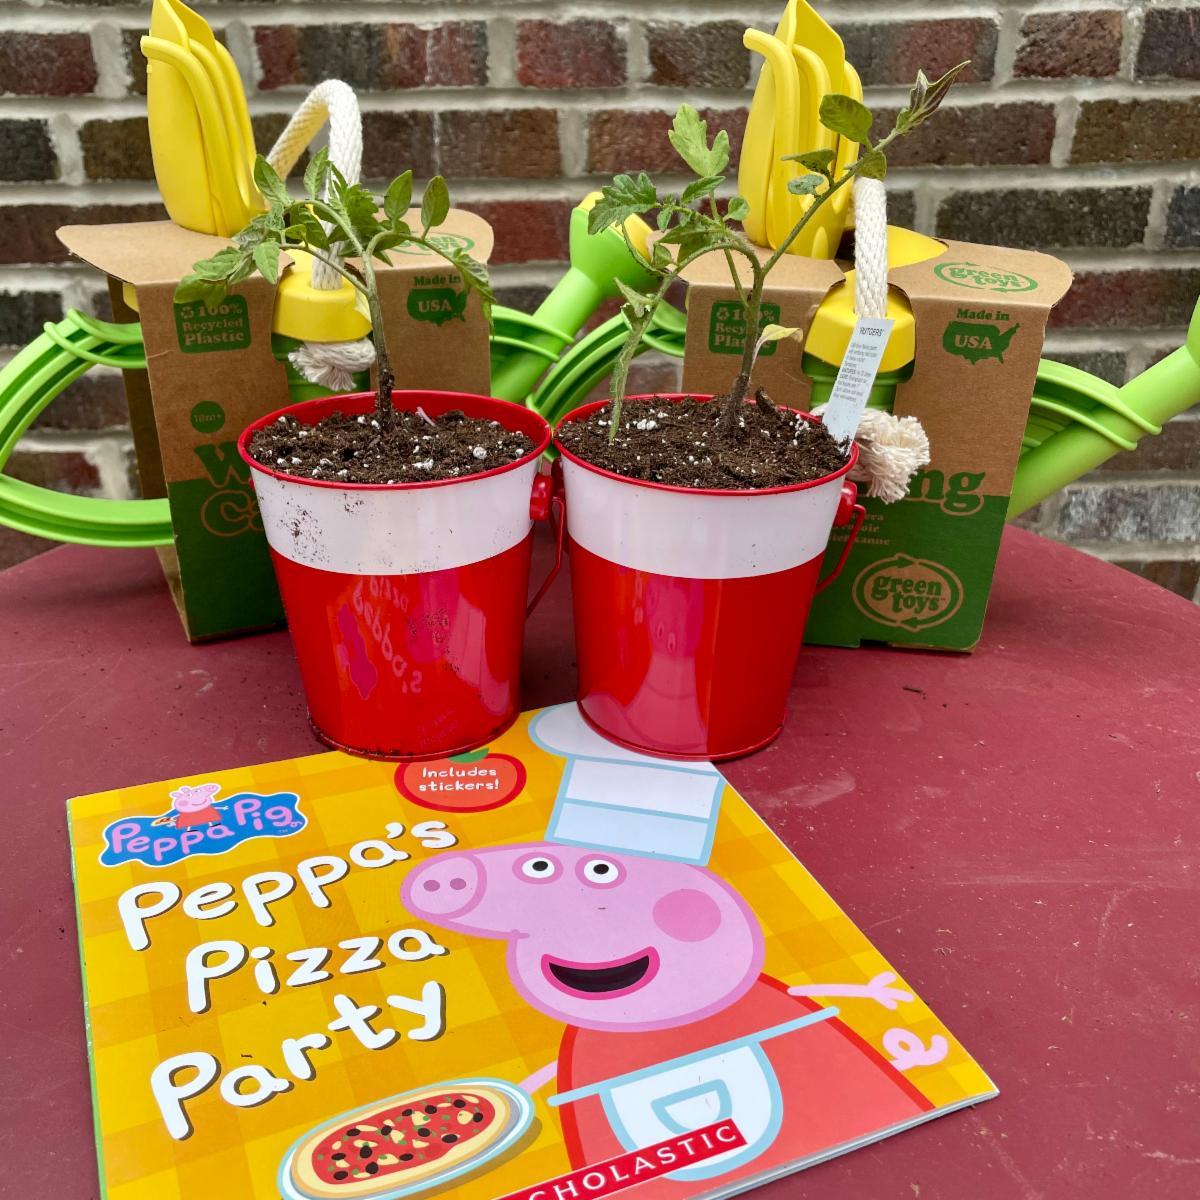 Tomato transplants sit next to a copy of Peppa's Pizza Party